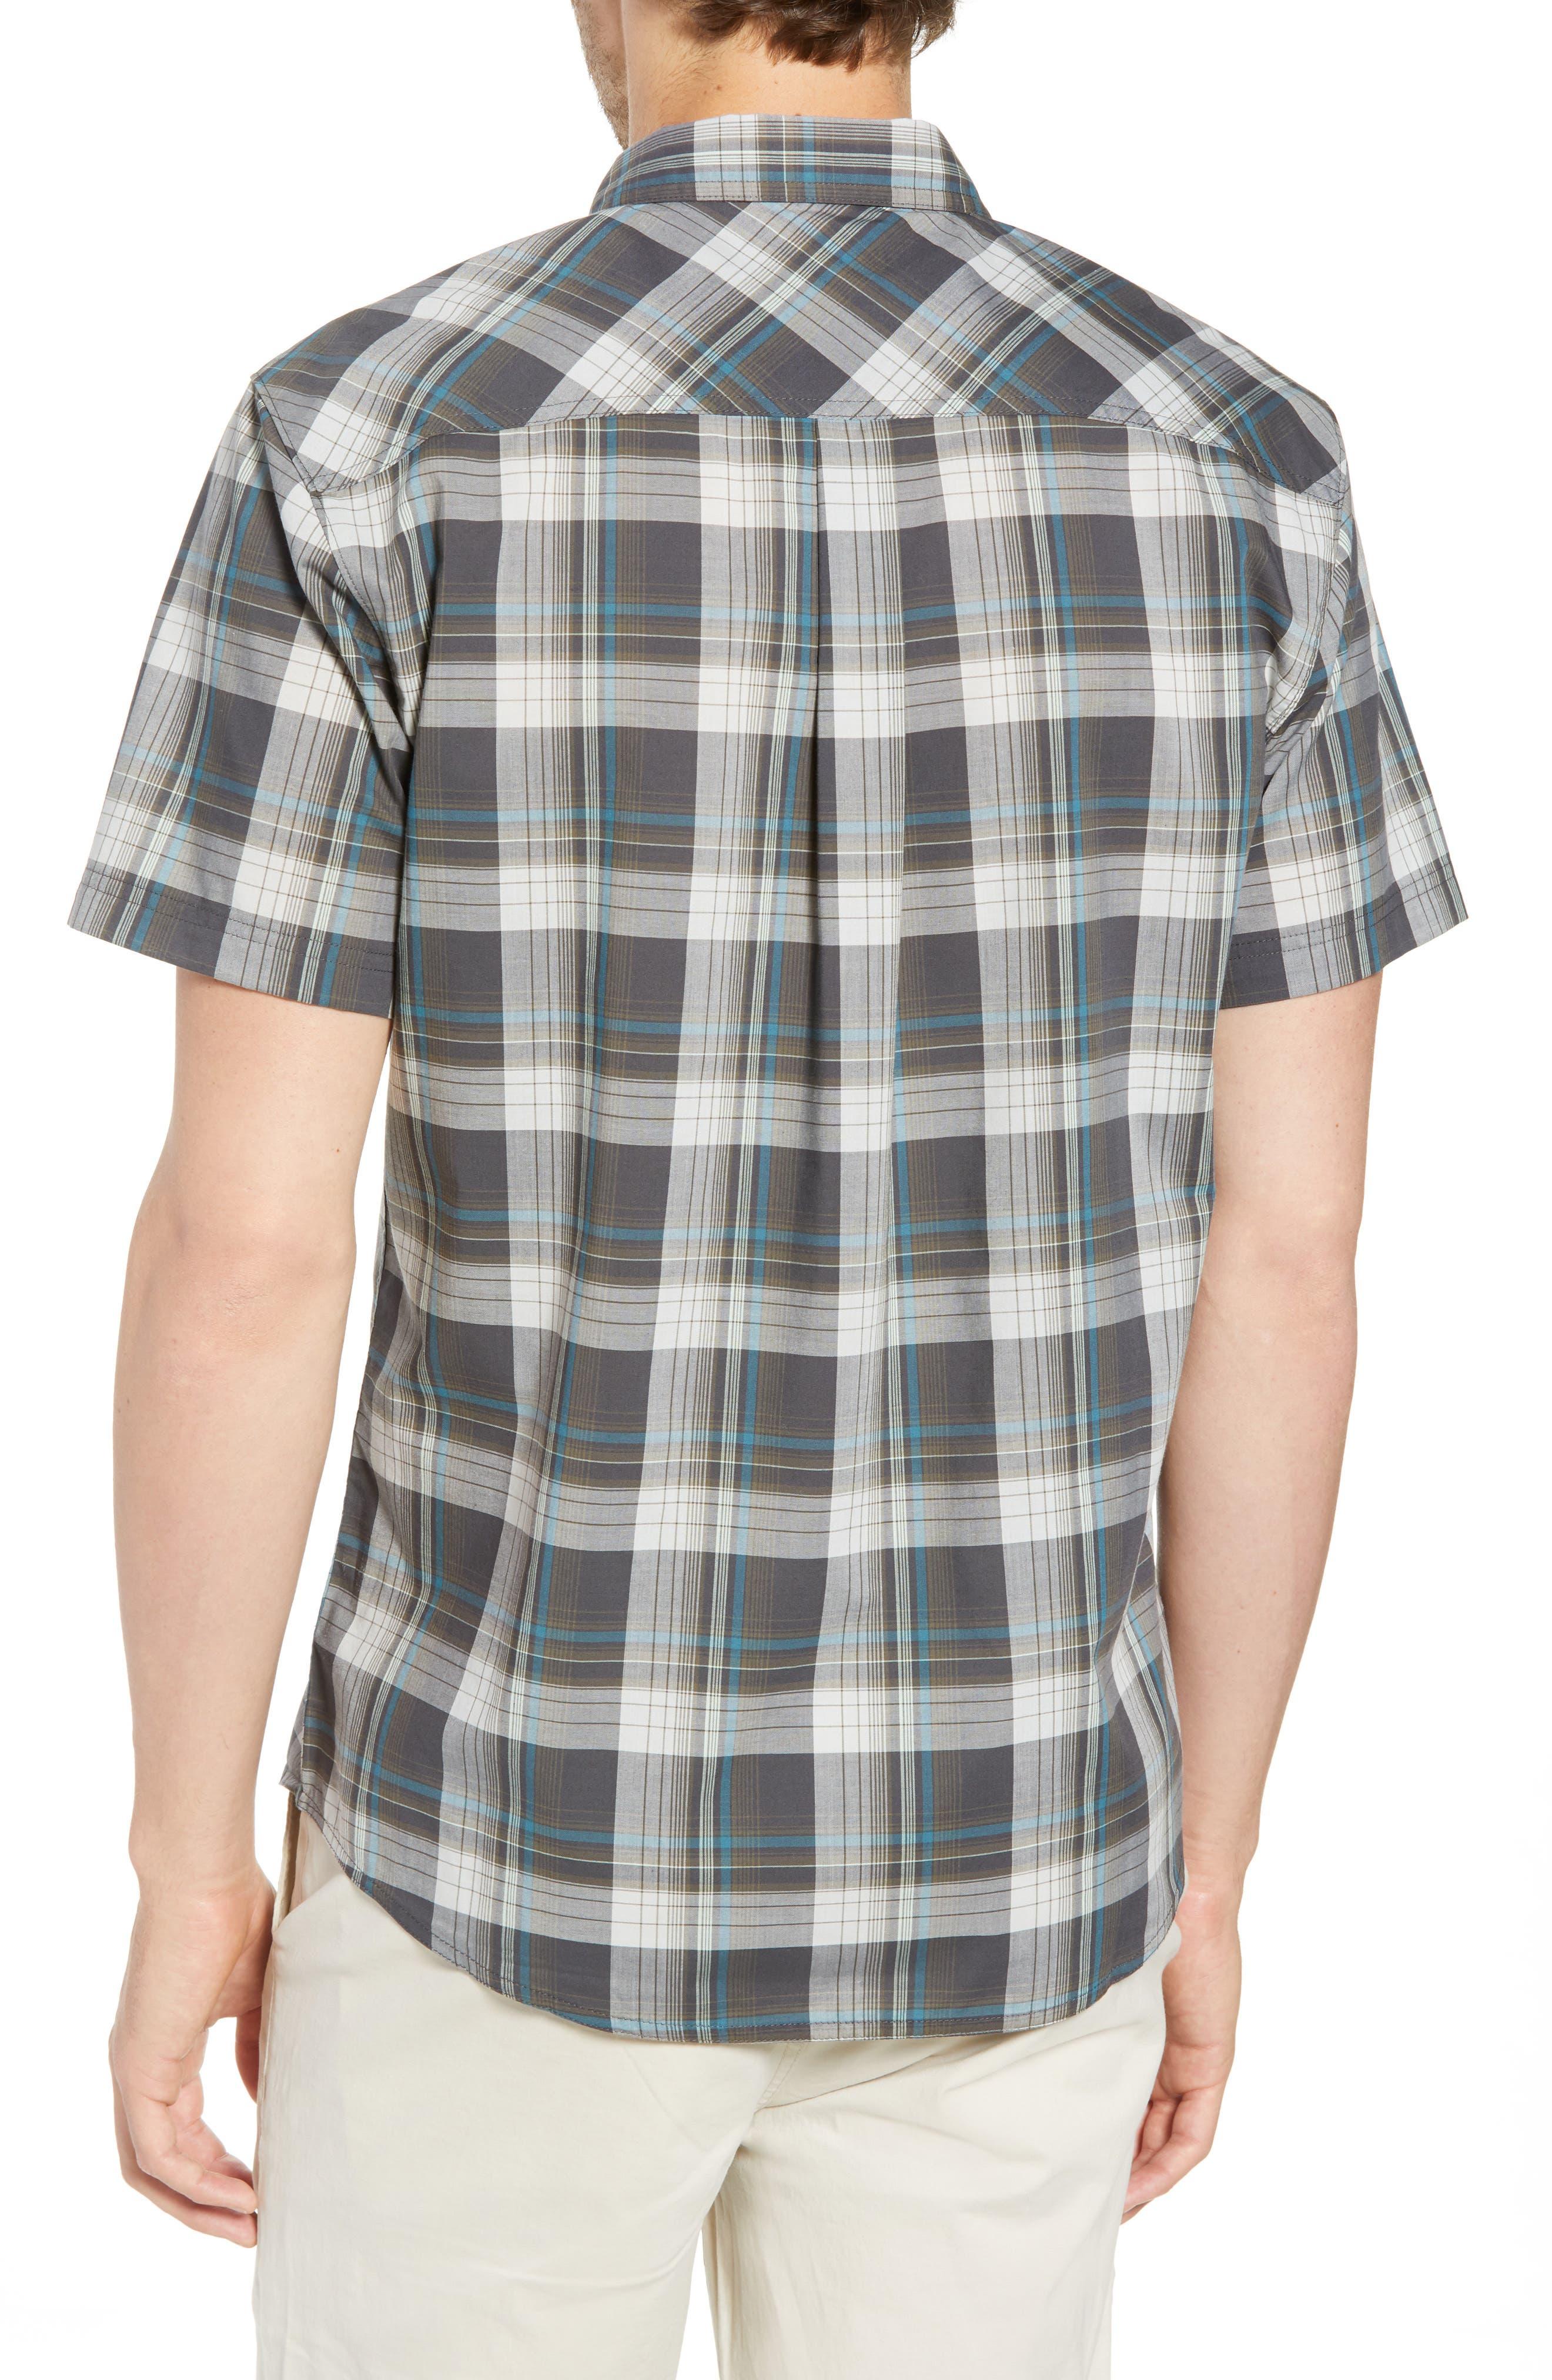 Gentry Short Sleeve Shirt,                             Alternate thumbnail 2, color,                             020